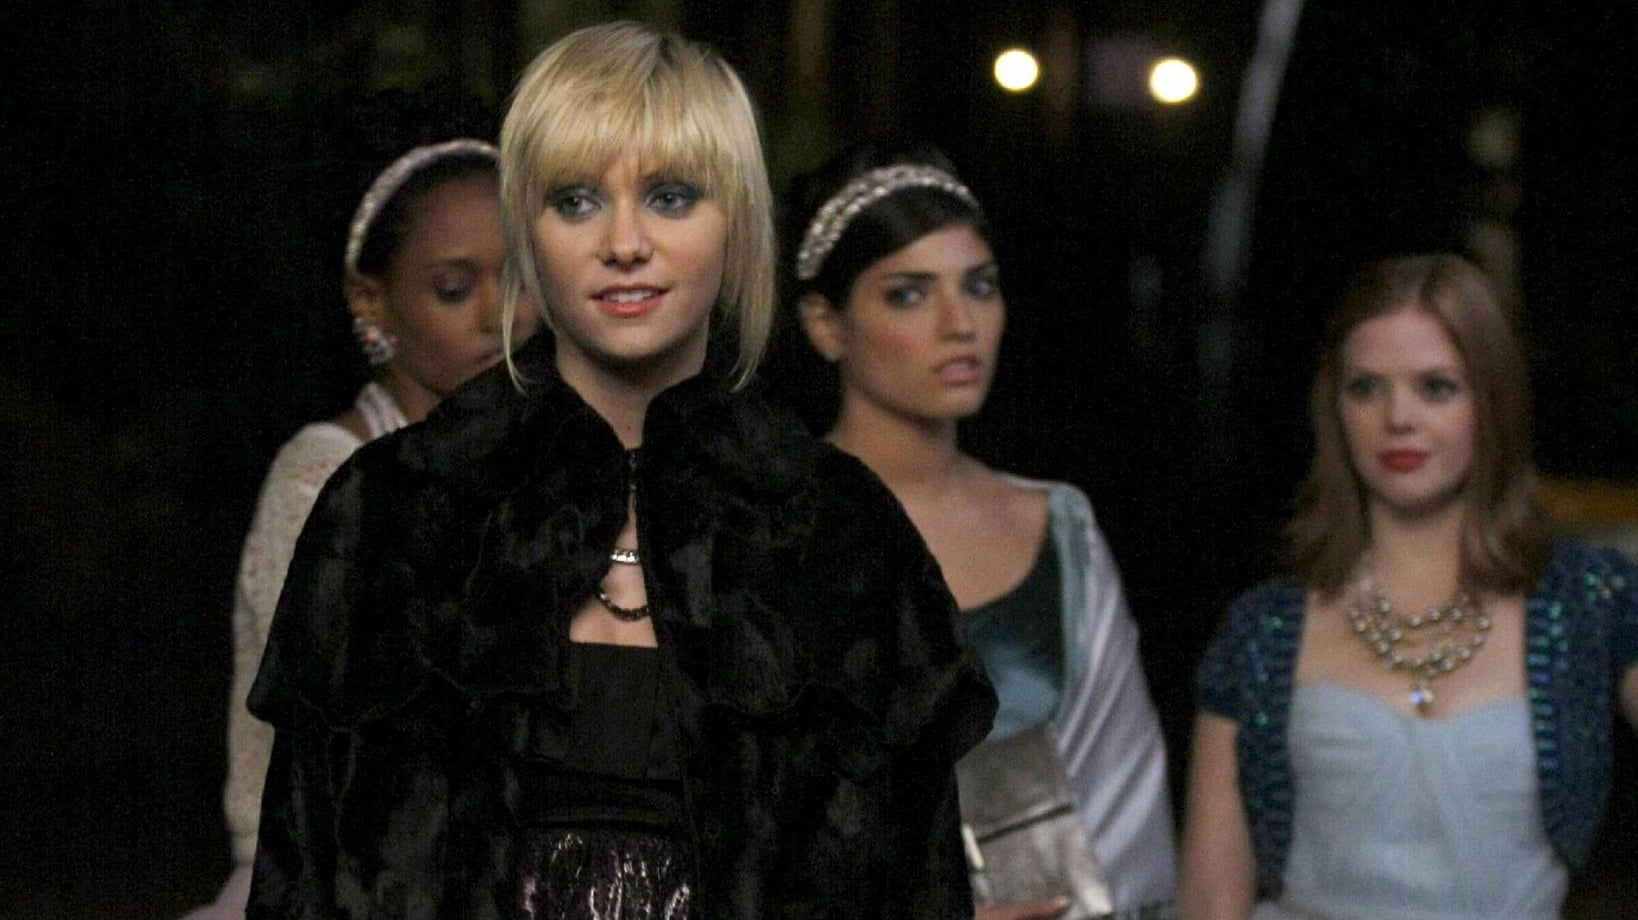 Gossip Girl - Season 2 - Watch Online Movies for Free on ...